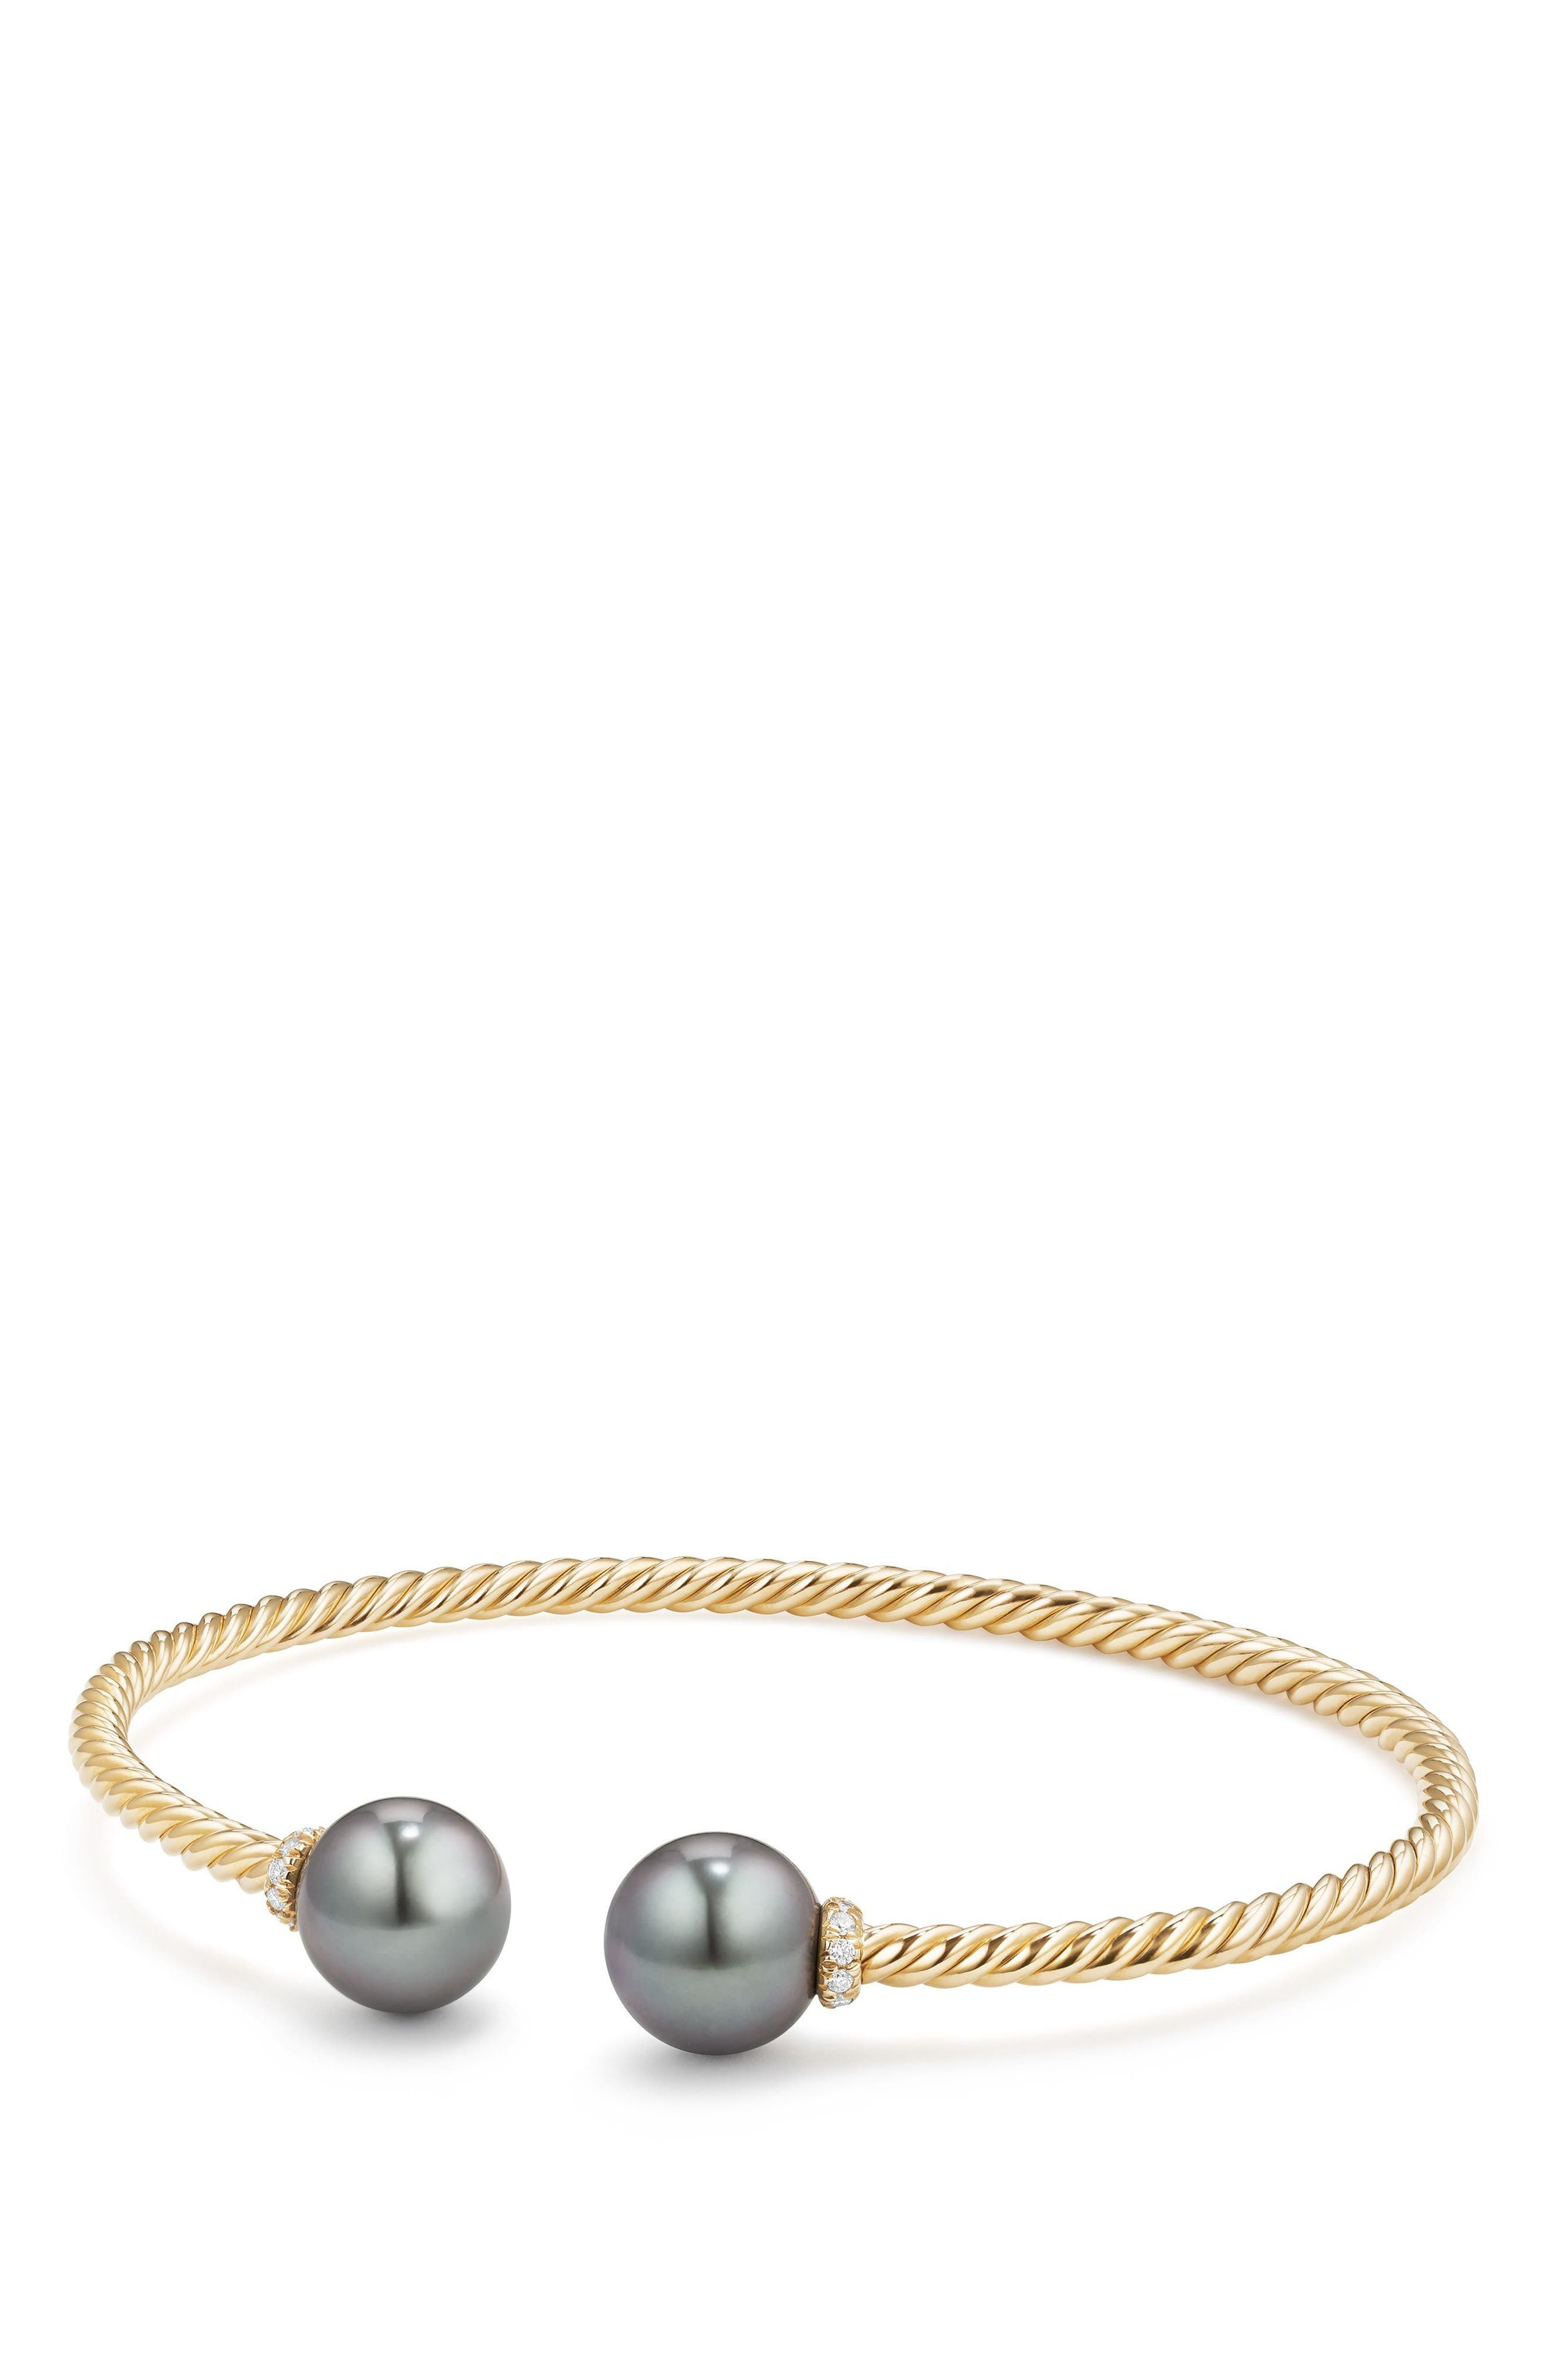 Main Image - David Yurman Solari Bead Bracelet with Diamonds